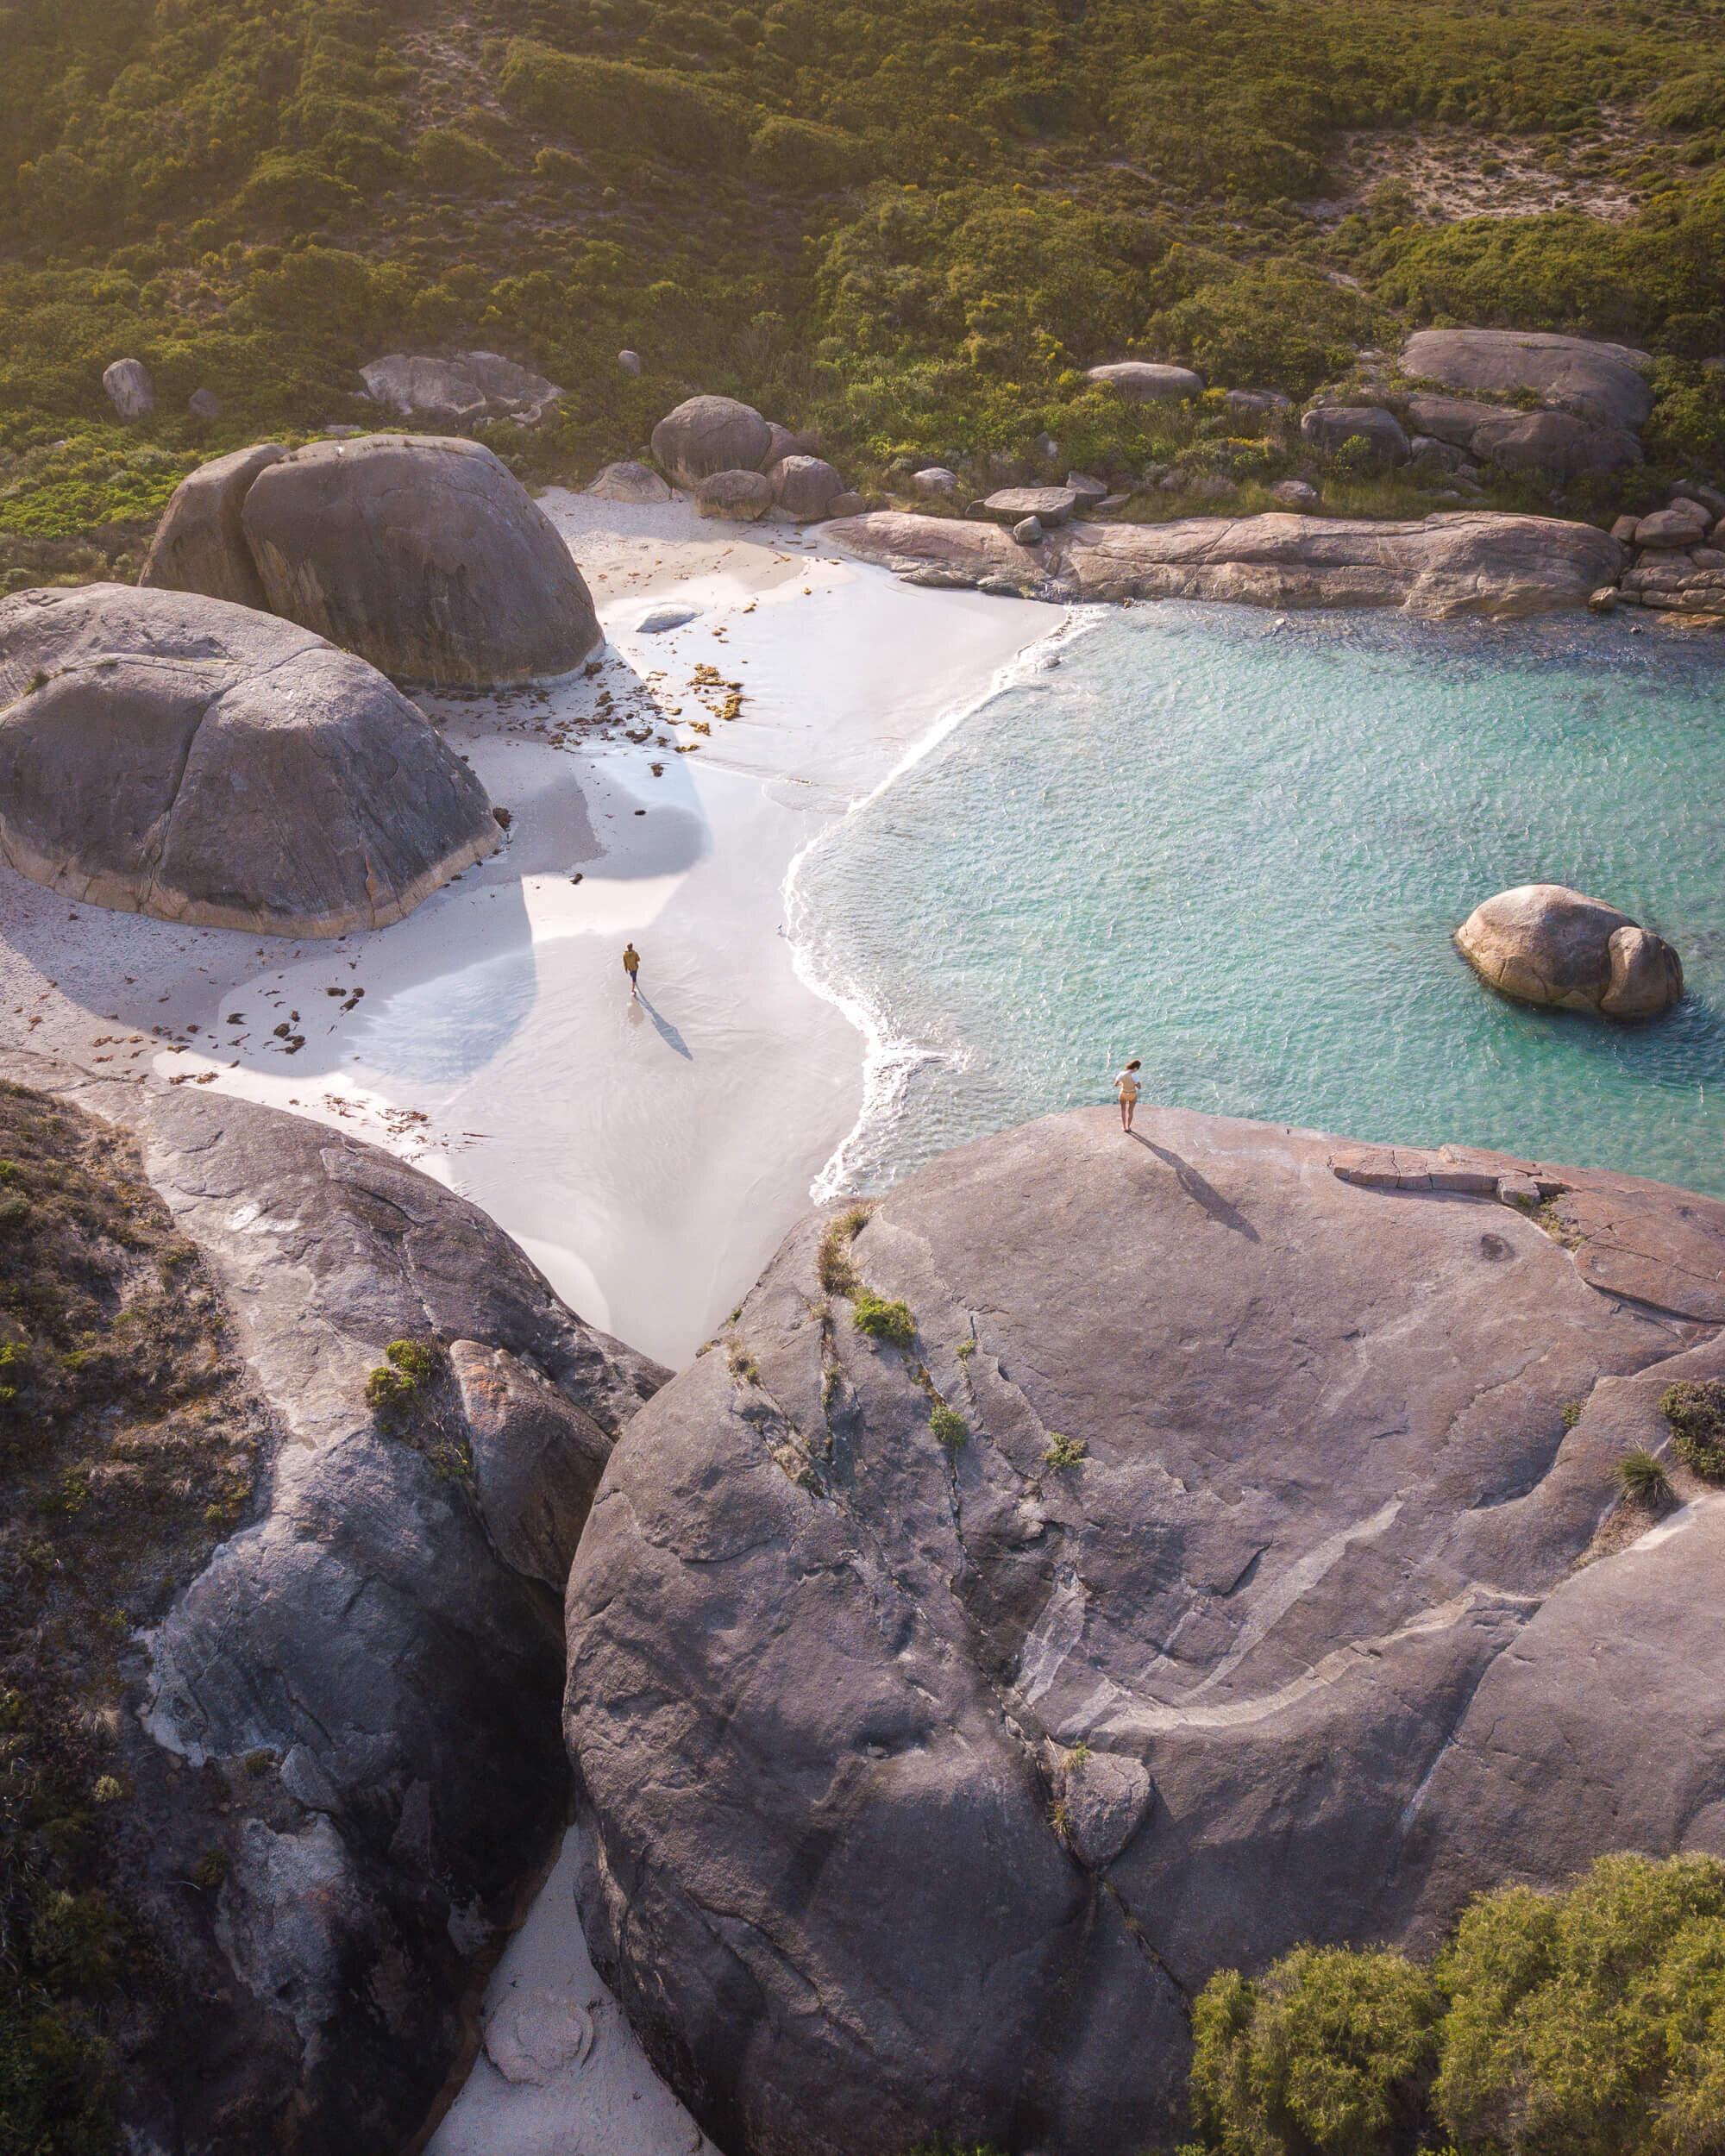 Elephant Rocks in Australia.